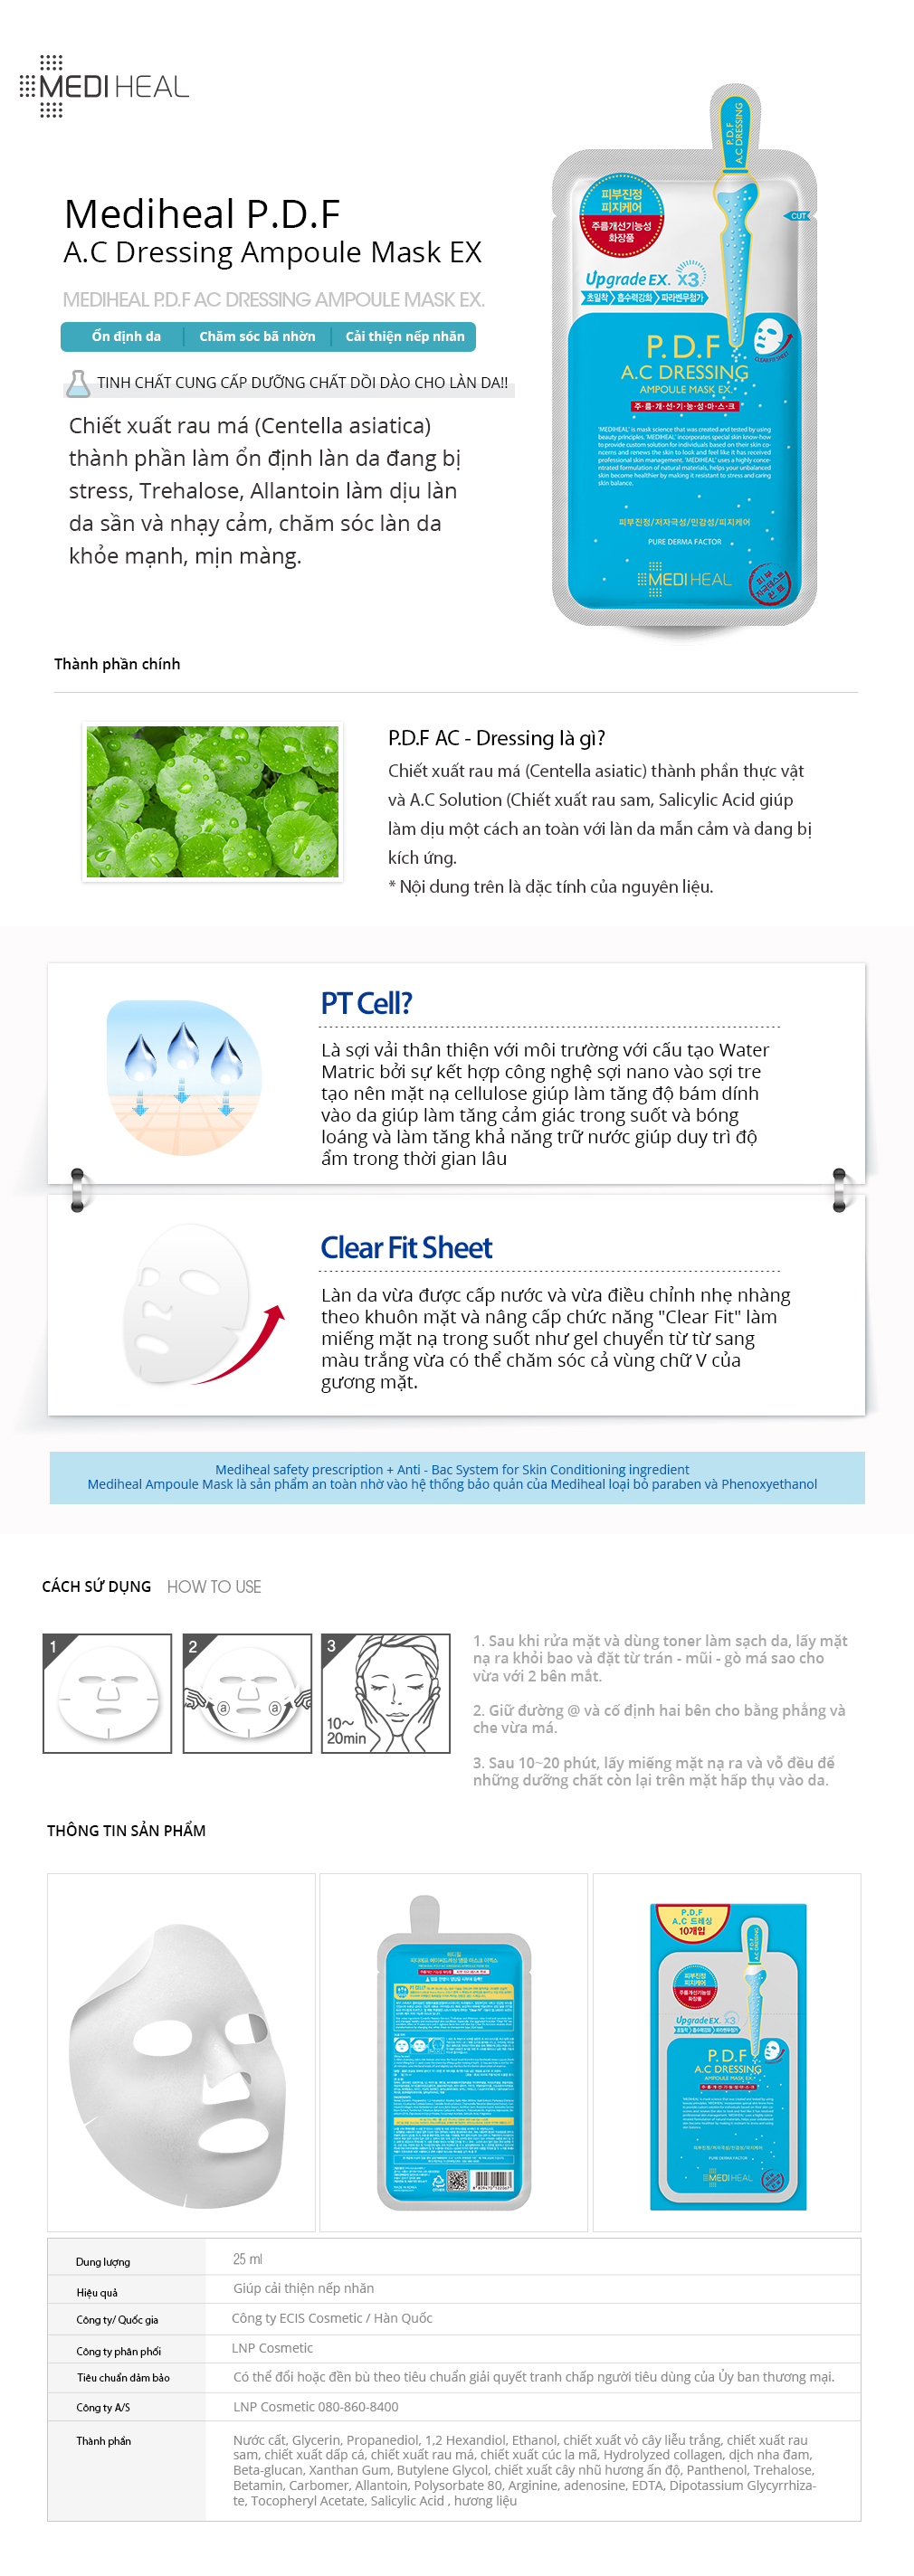 Mediheal PDF AC Dressing Ampoule Mask